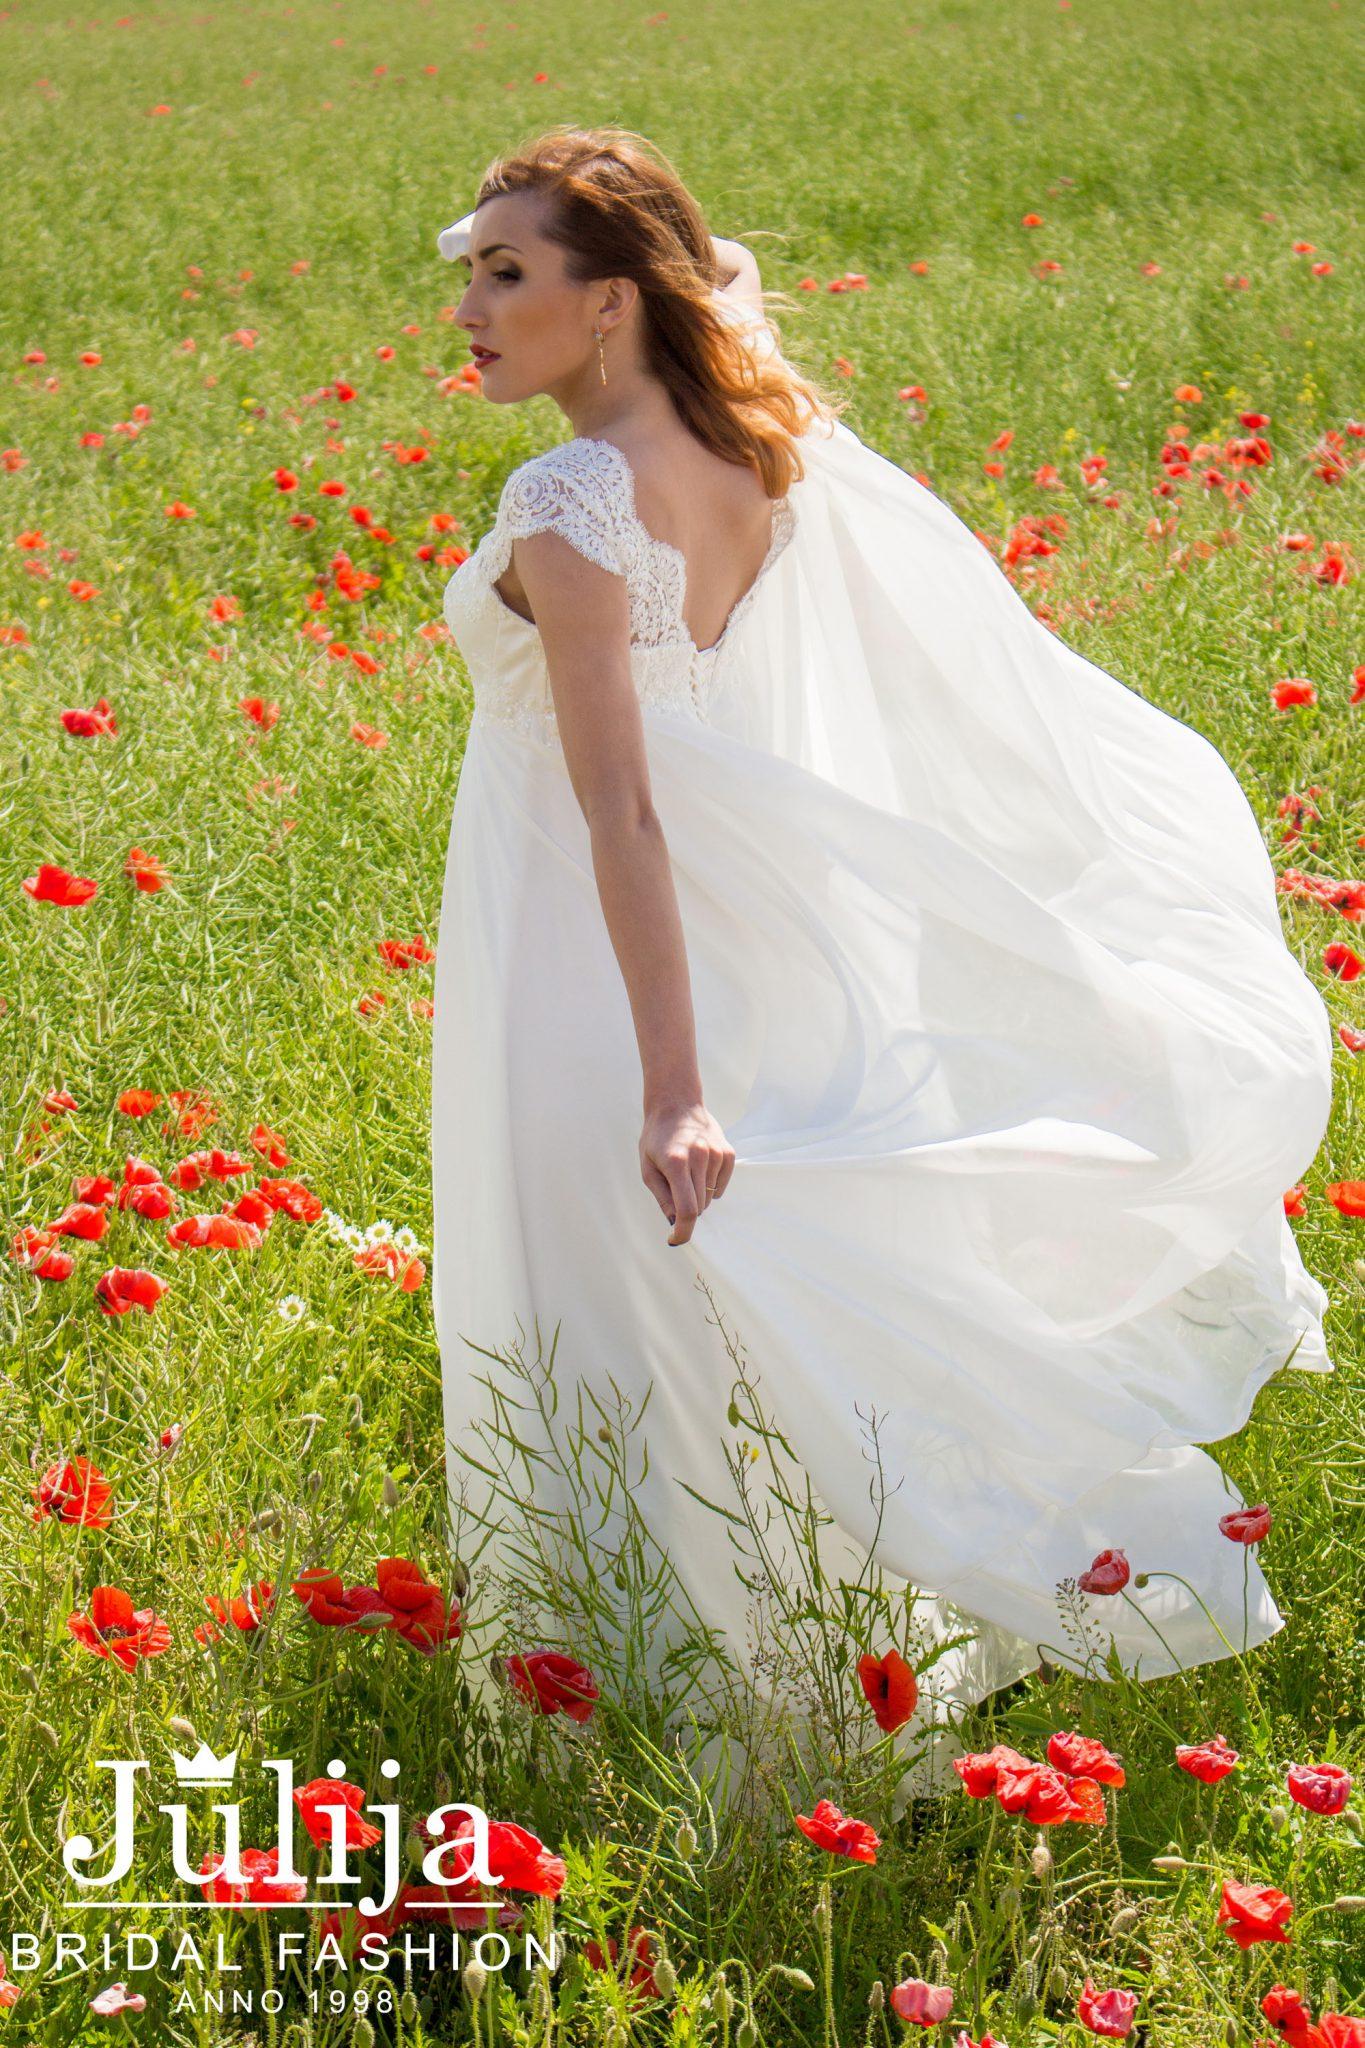 Pasadena | Wholesale wedding dresses - Julija Bridal Fashion